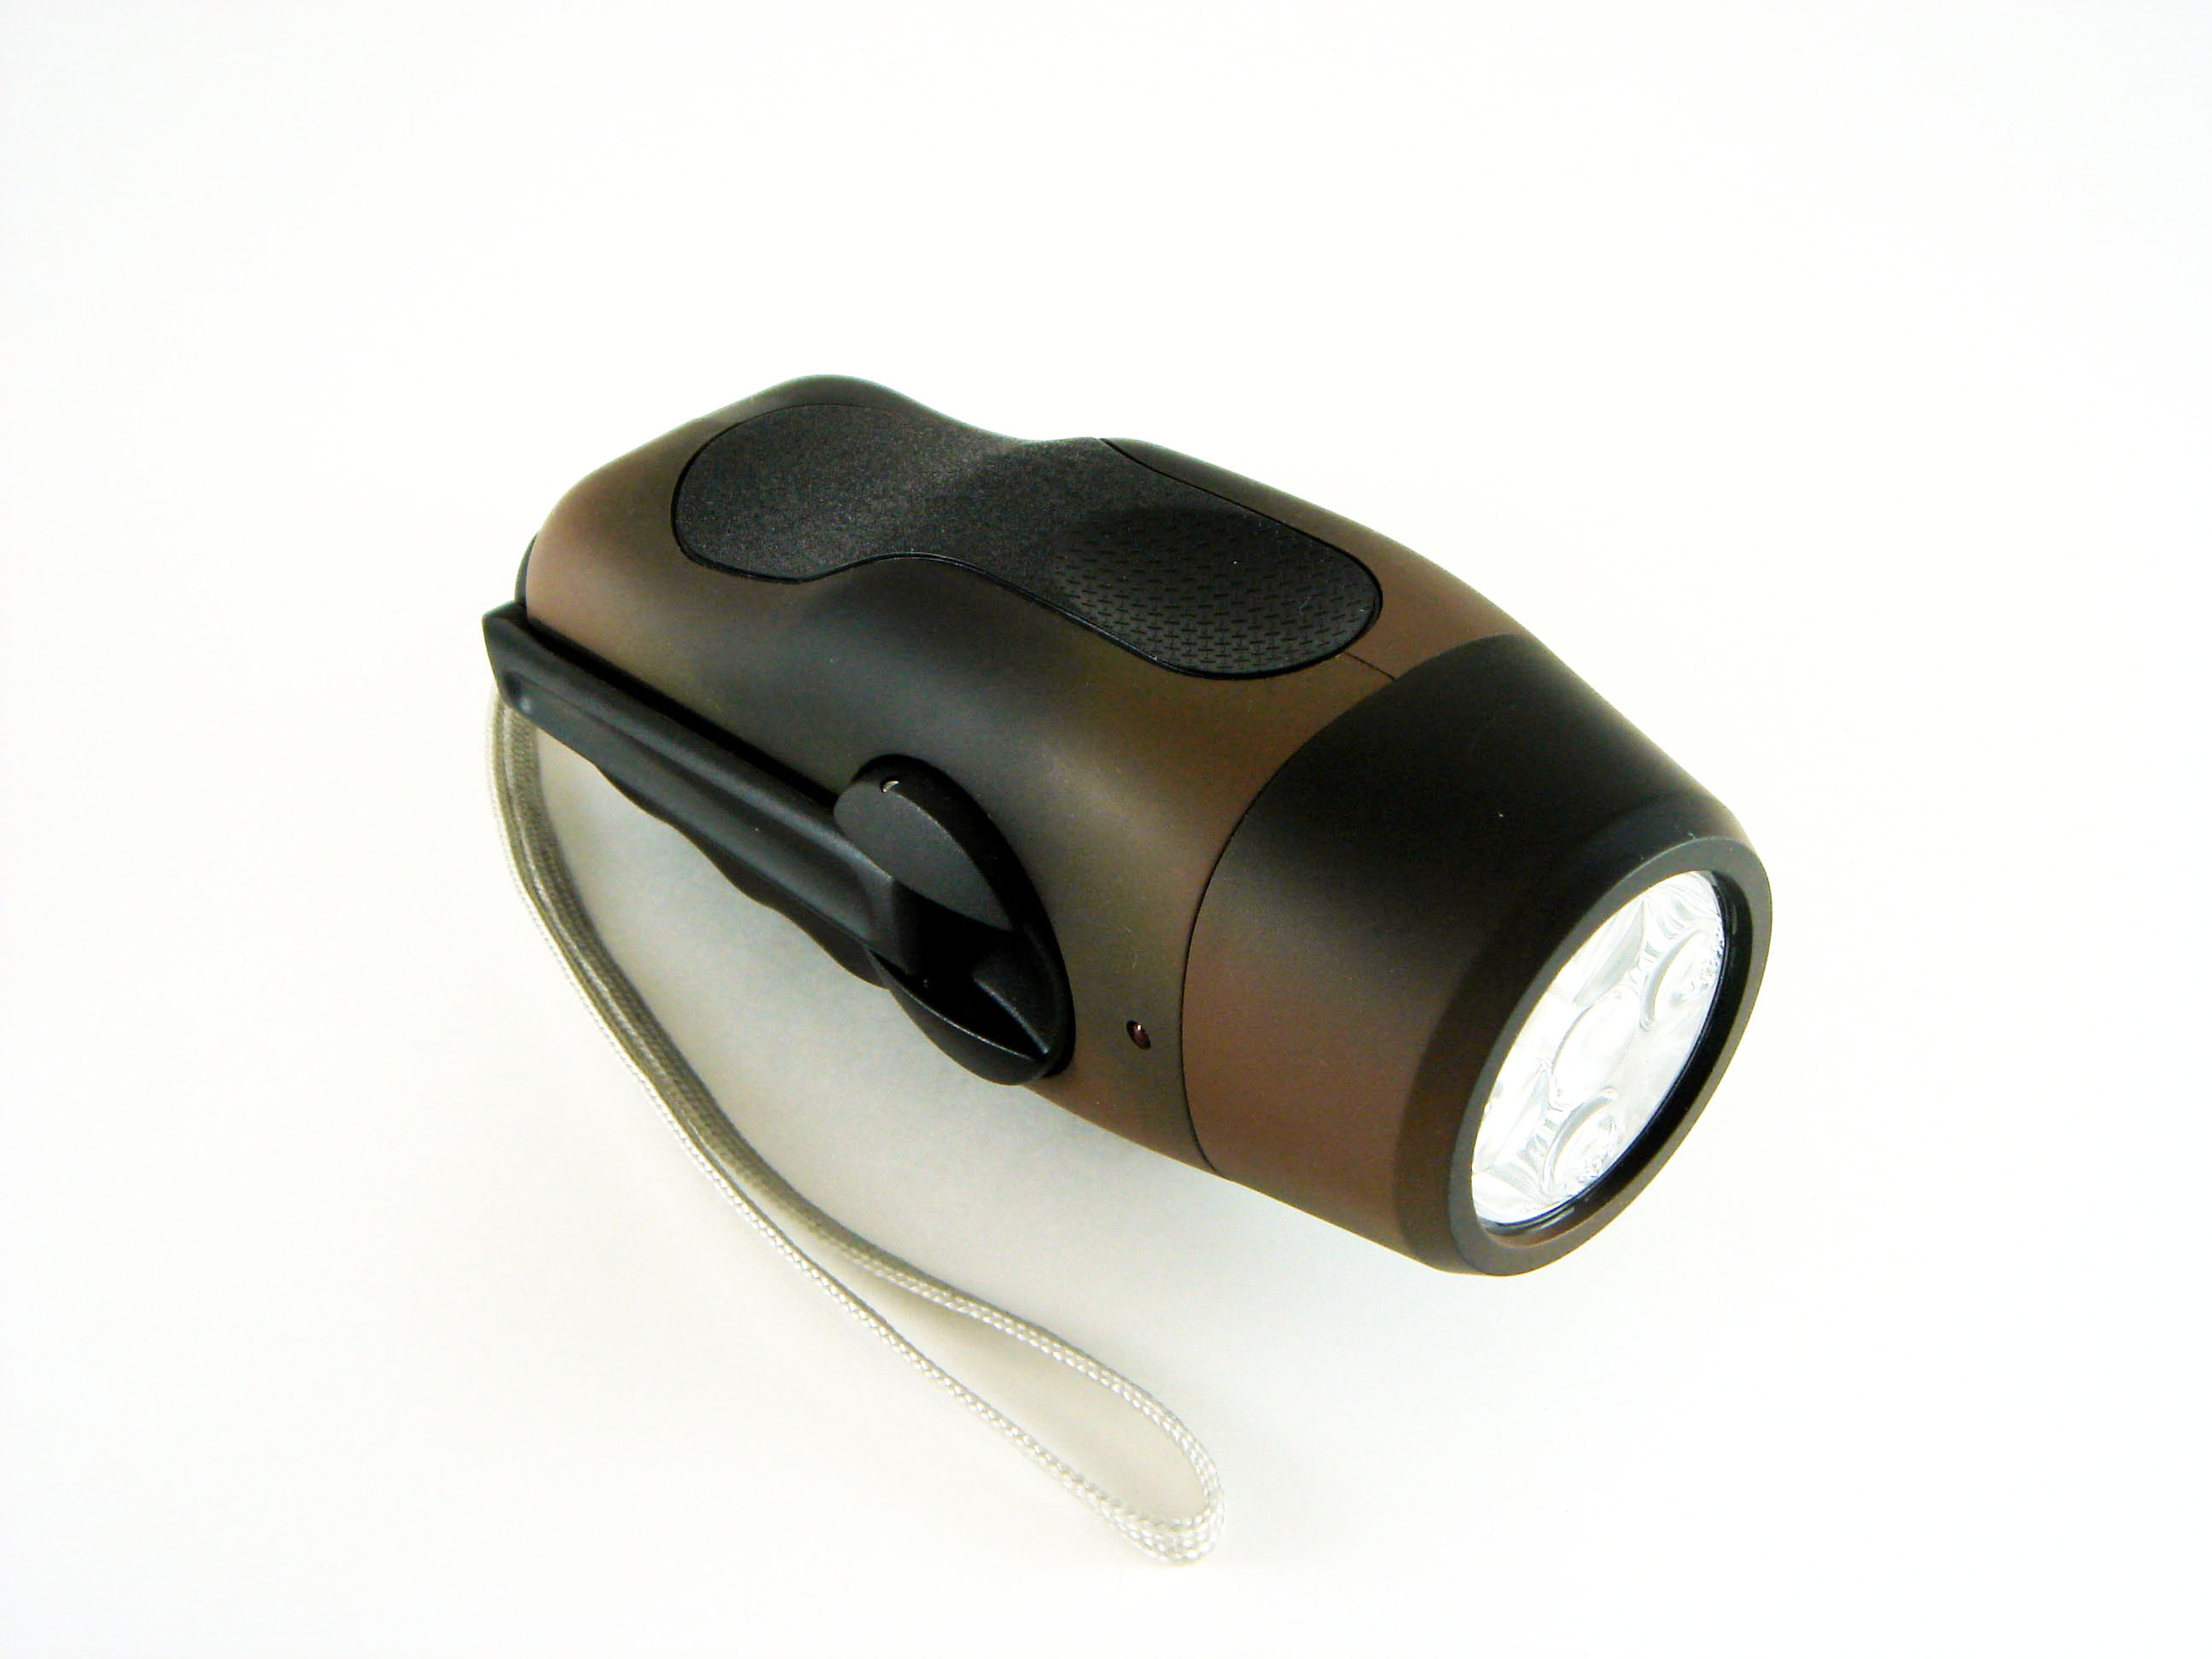 Hand Crank Powered Army Dynamo 5 LEDs Flashlight